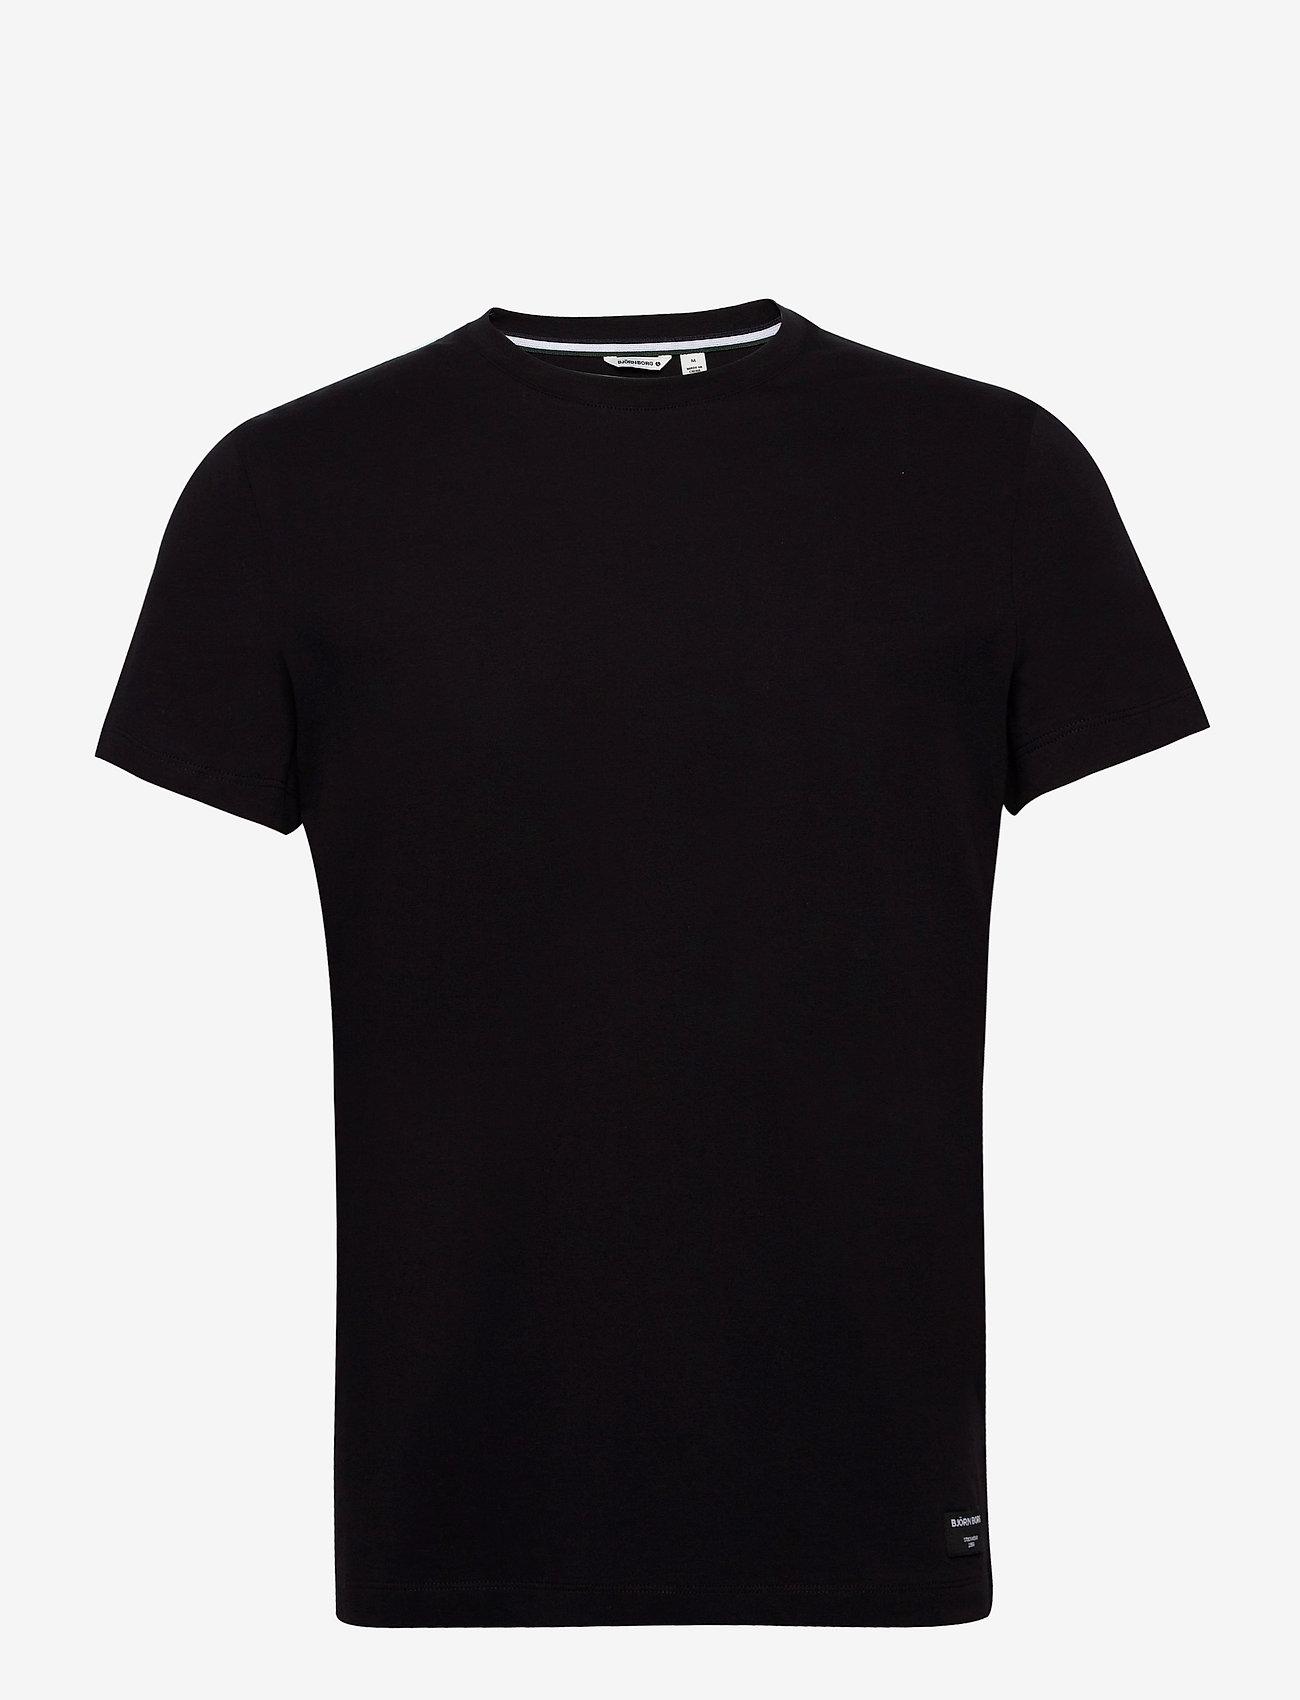 Björn Borg - TEE CENTRE CENTRE - basic t-shirts - black beauty - 0